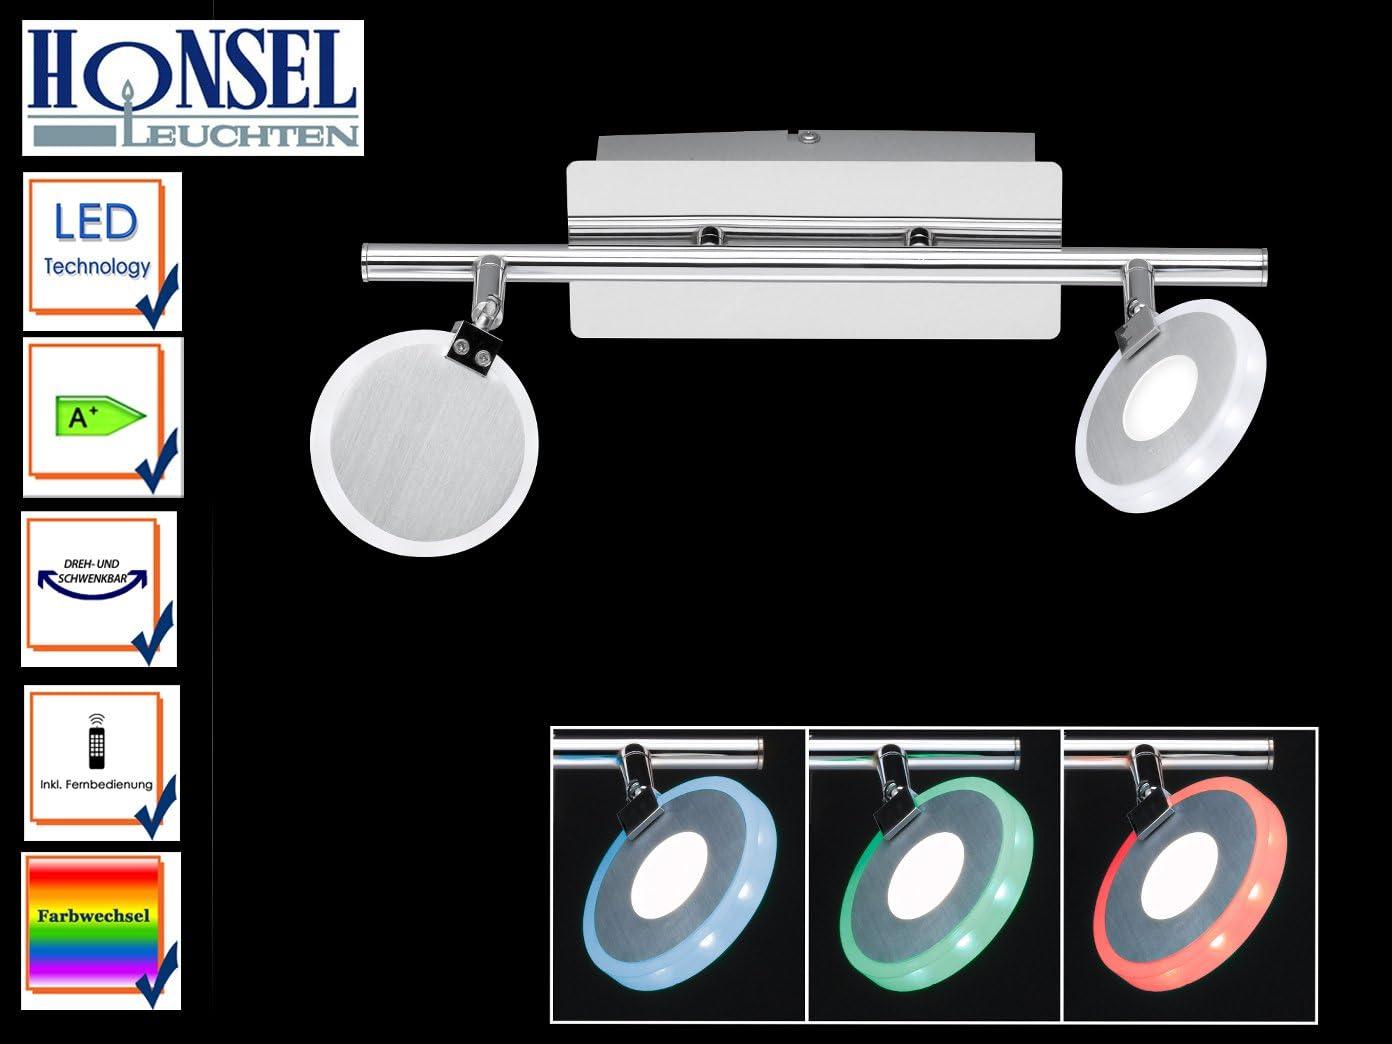 Honsel 2de flammiger LED 767702540000Tonic RGBW, Mando a Distancia, Cambio de Color, Foco orientable.